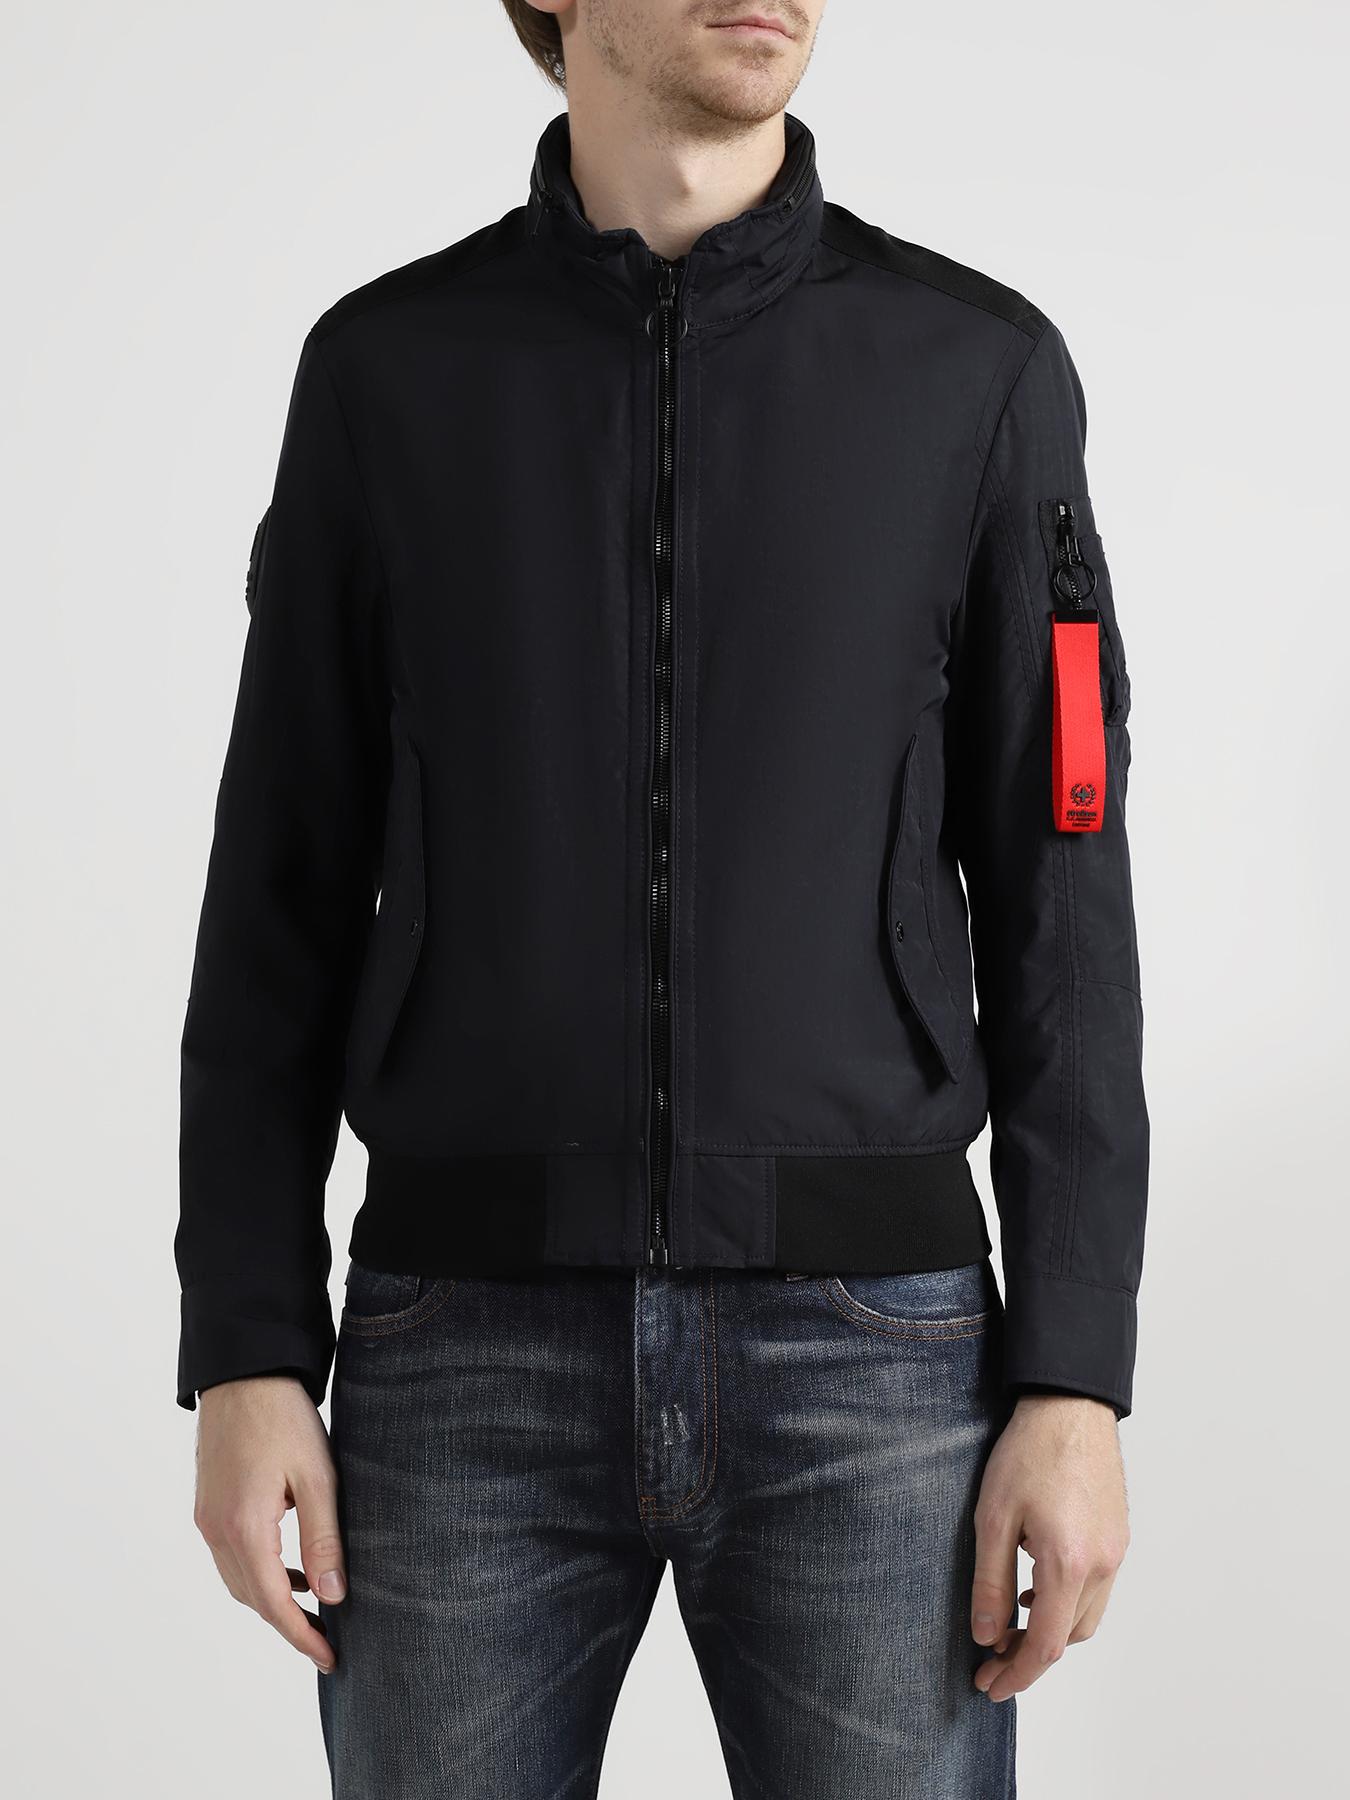 Ветровки Strellson Куртка